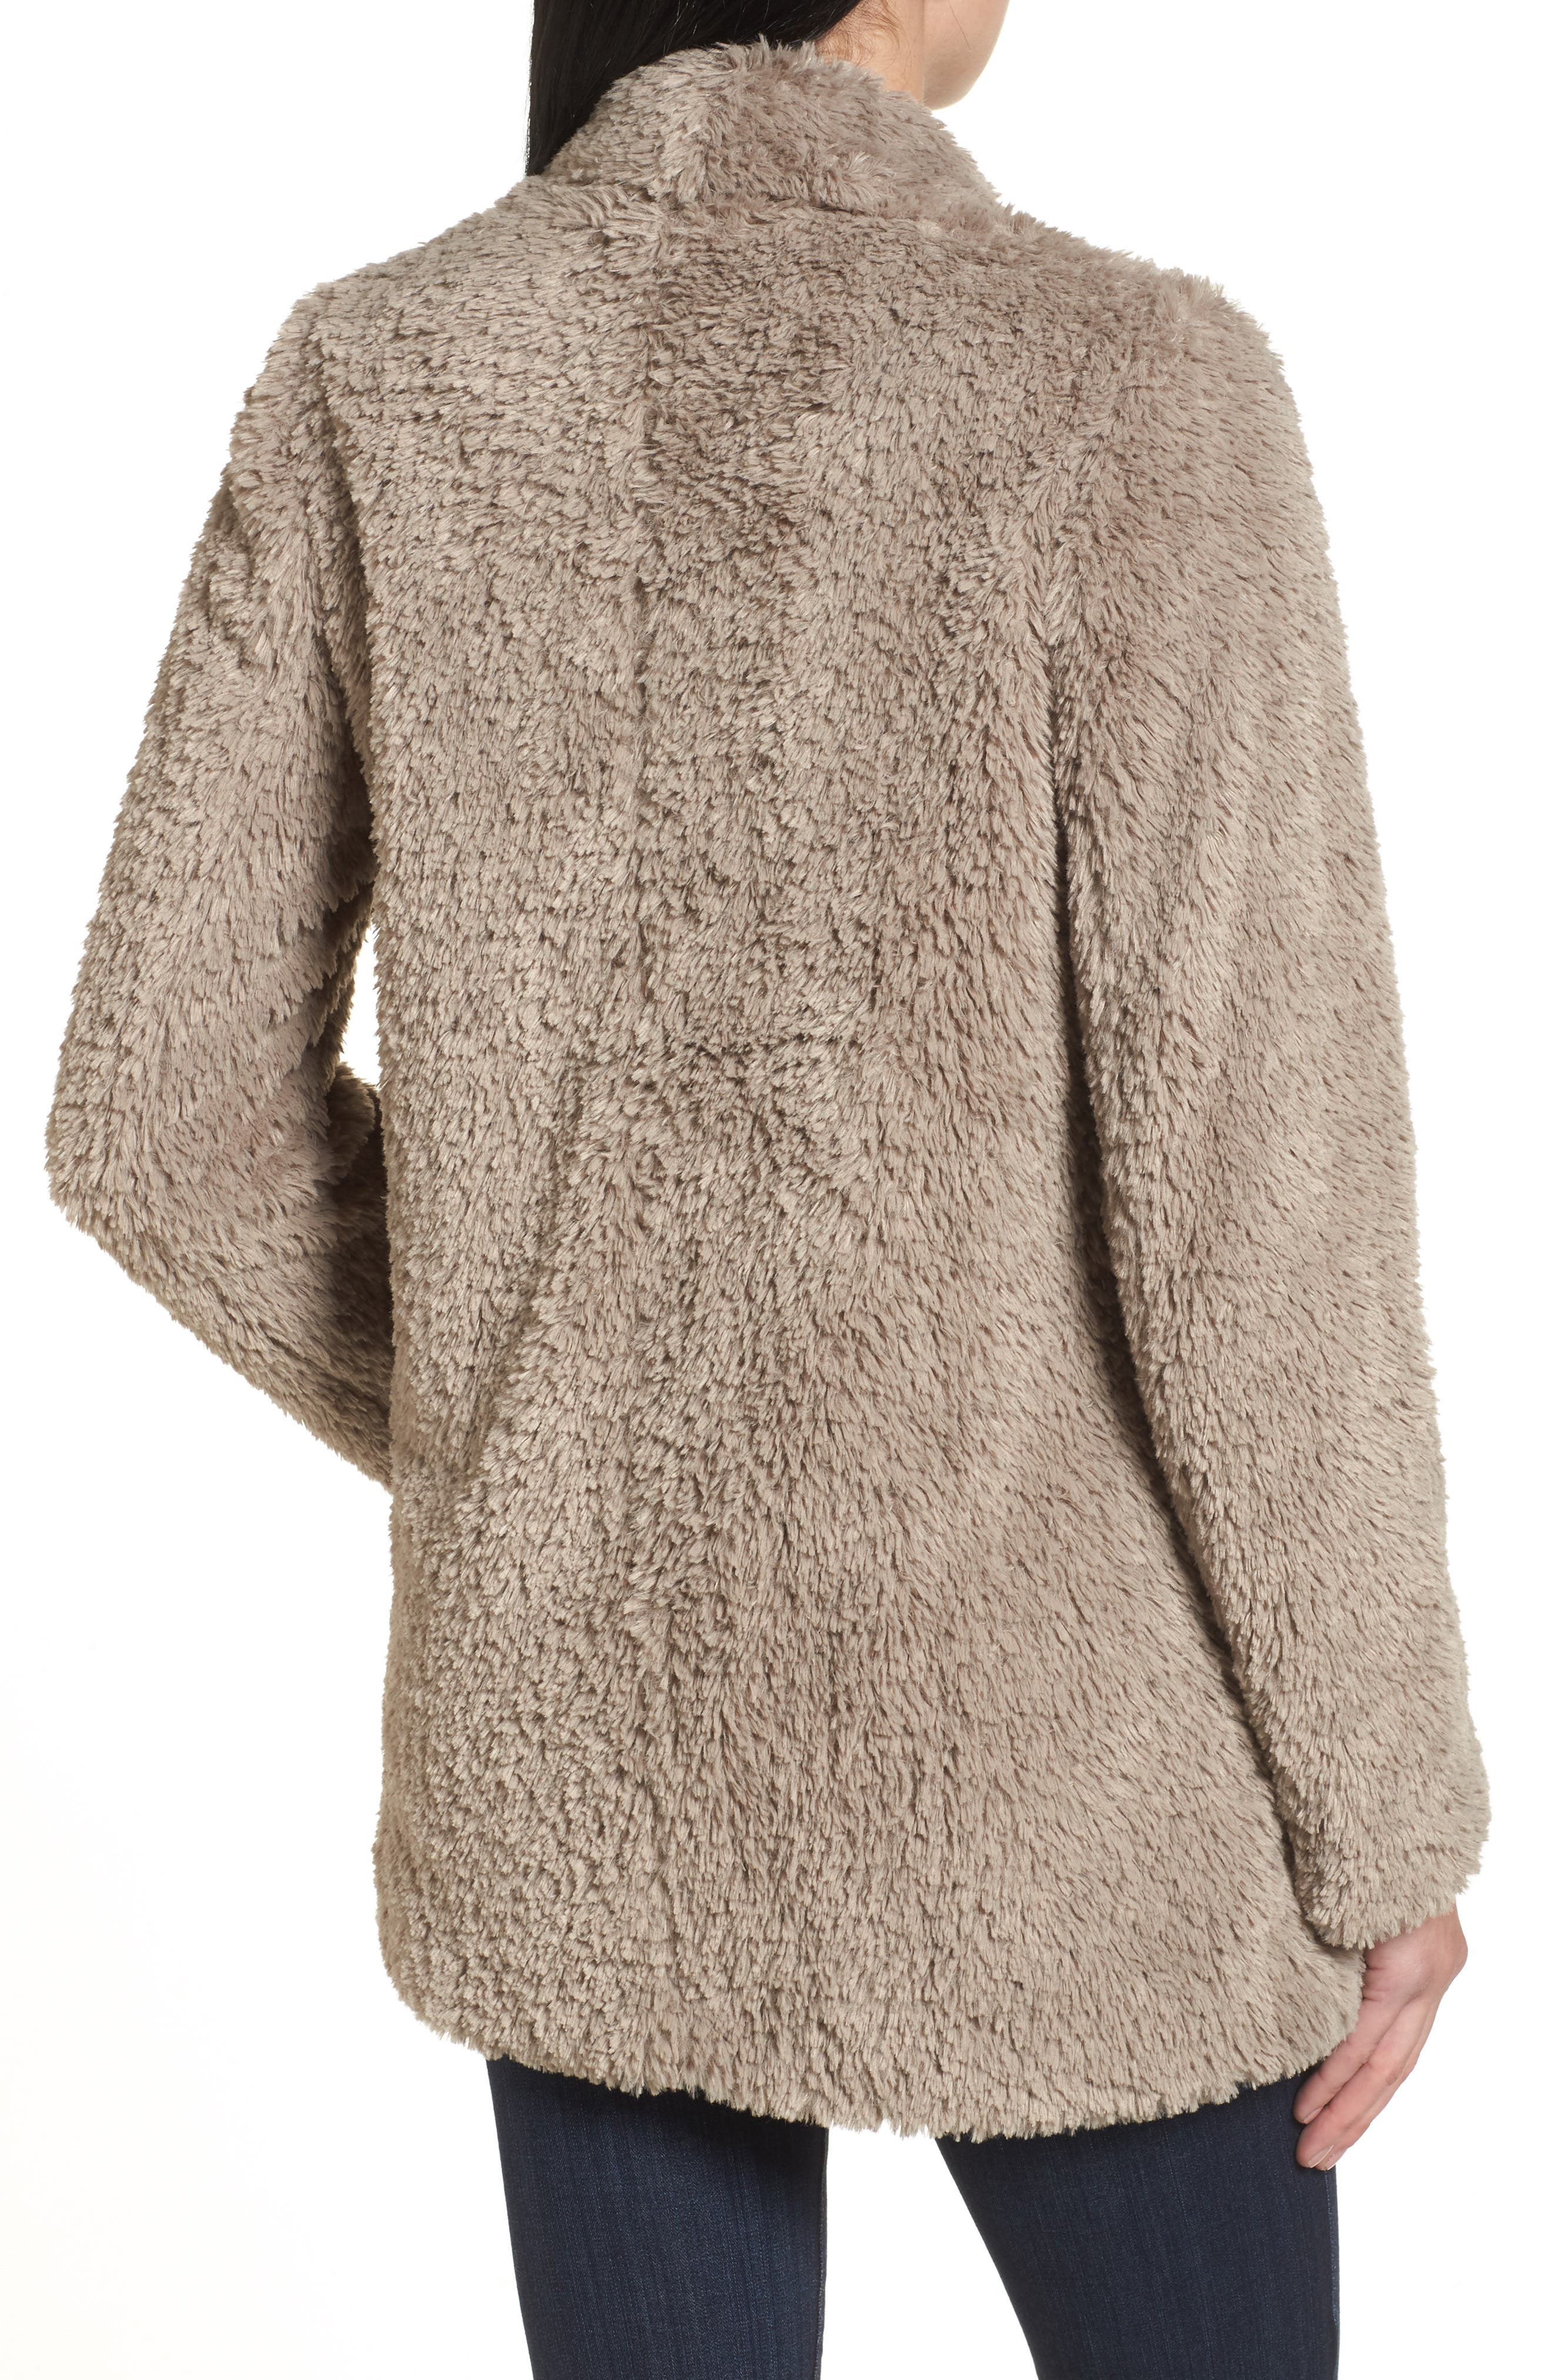 'Teddy Bear' Faux Fur Clutch Coat,                             Alternate thumbnail 2, color,                             Natural